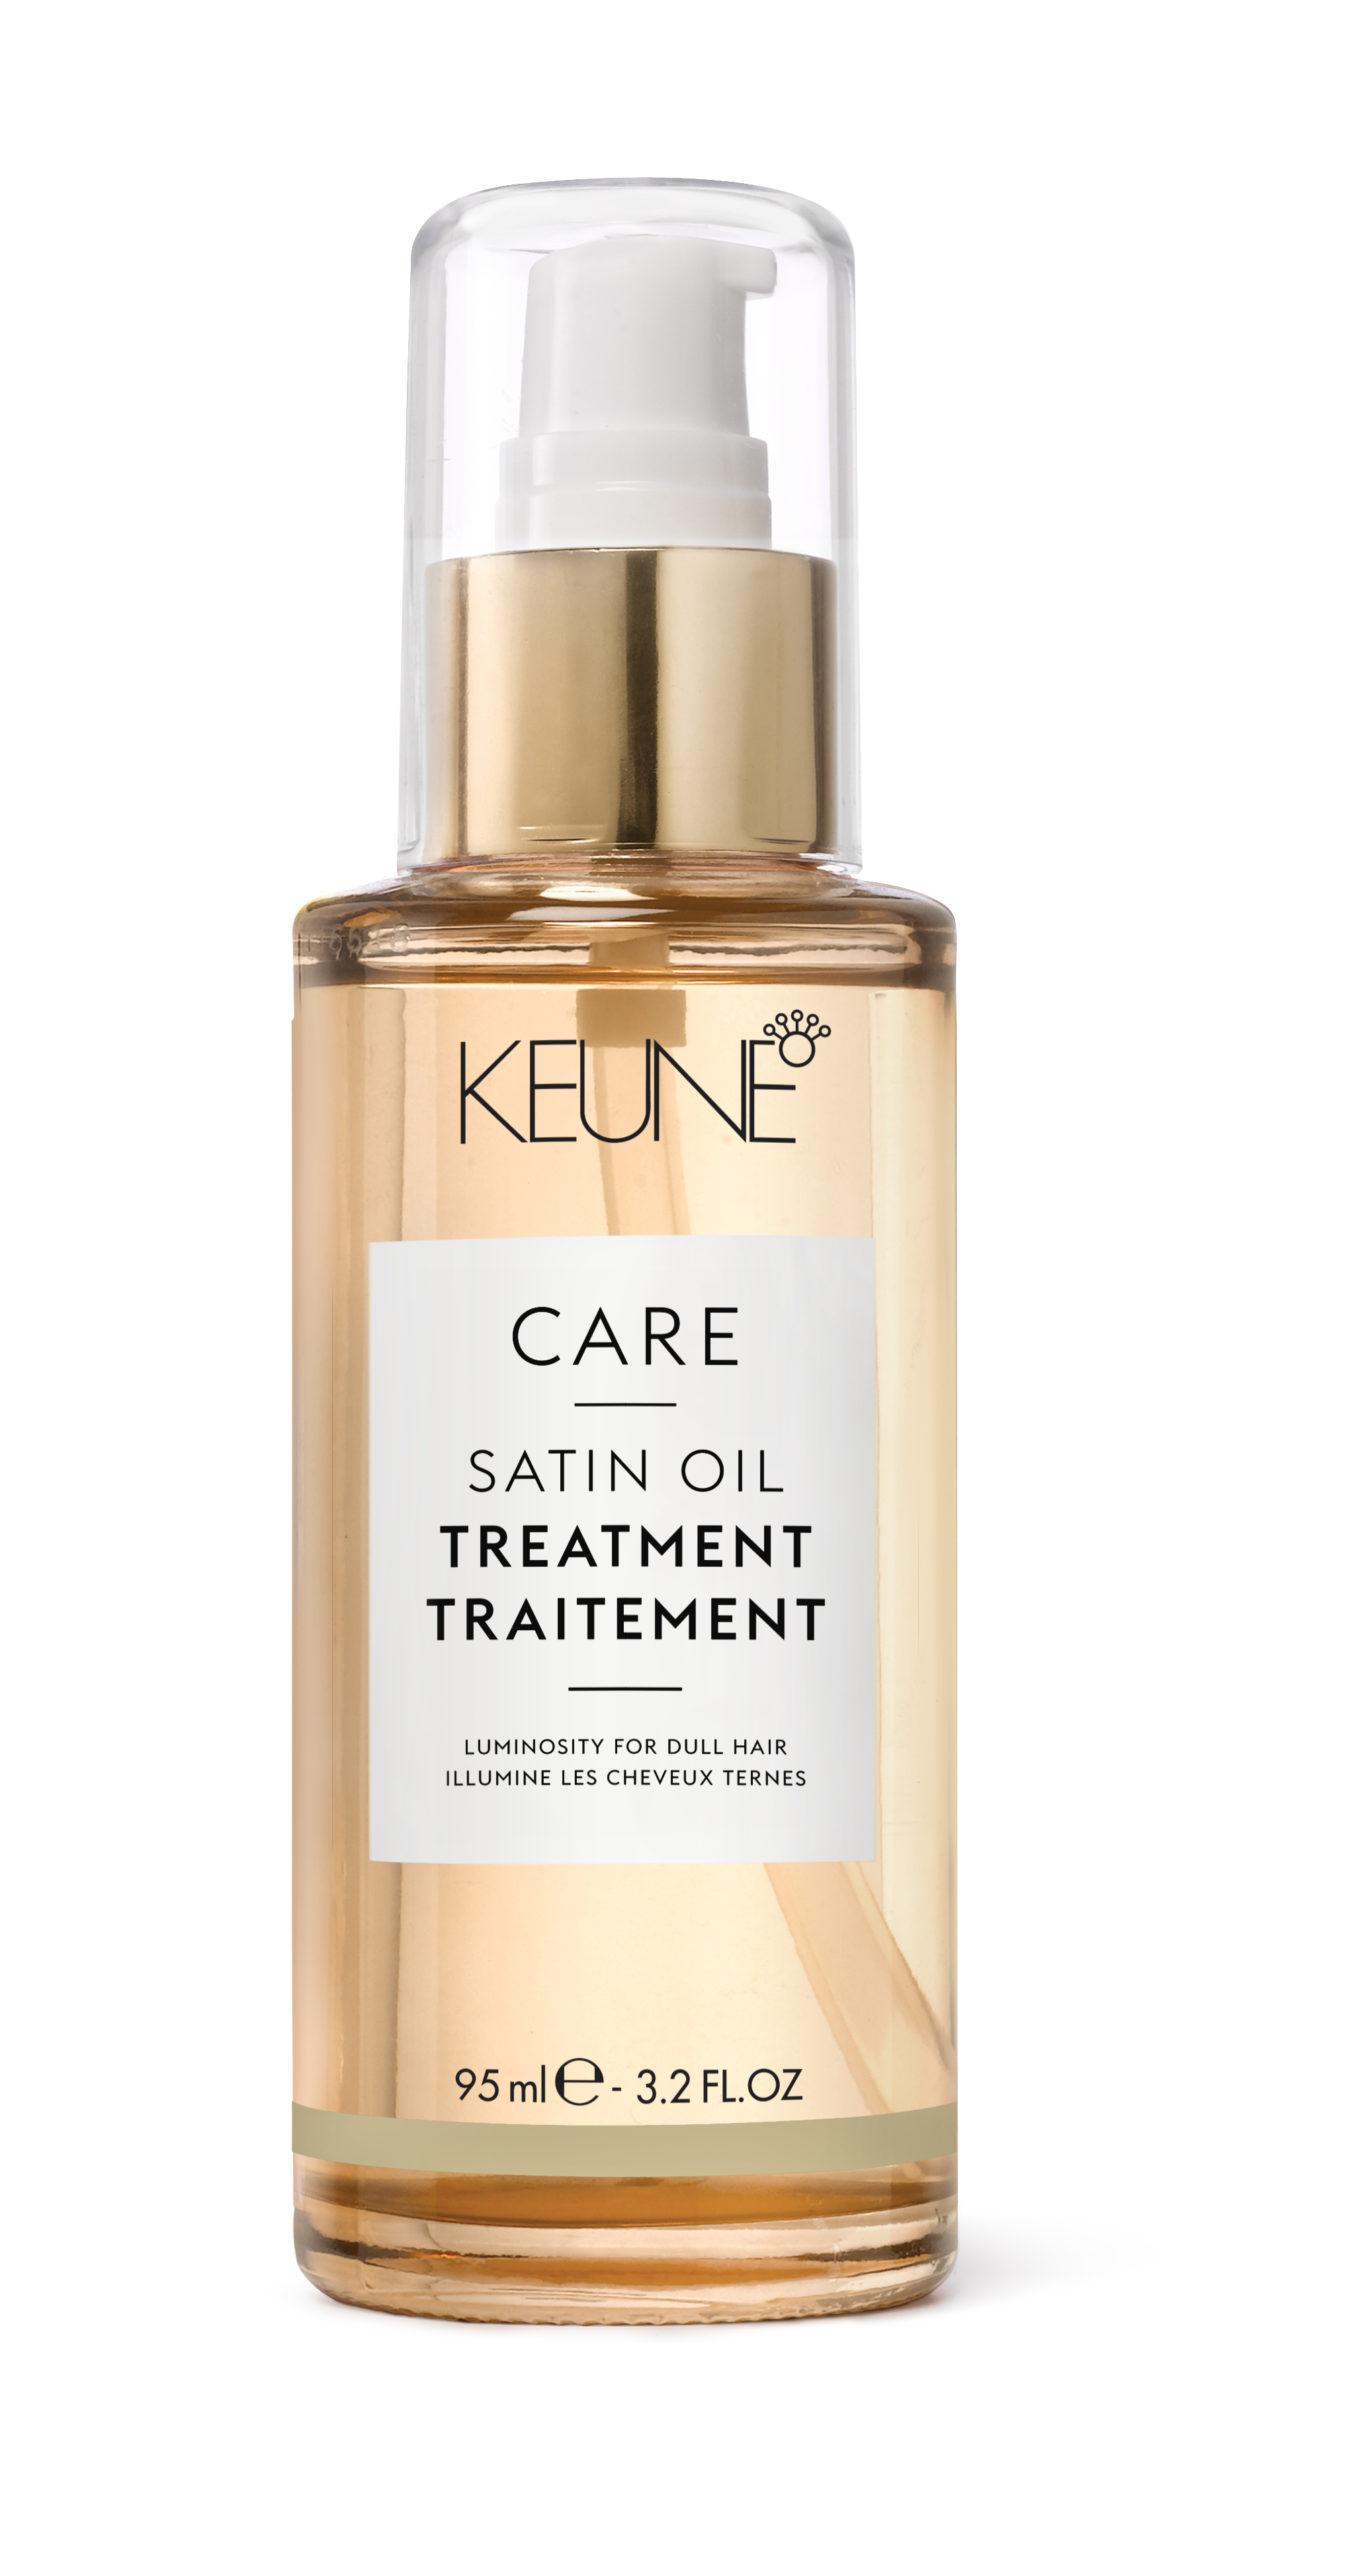 Care-Satin-oil-treatment-nieuw-def2-highres